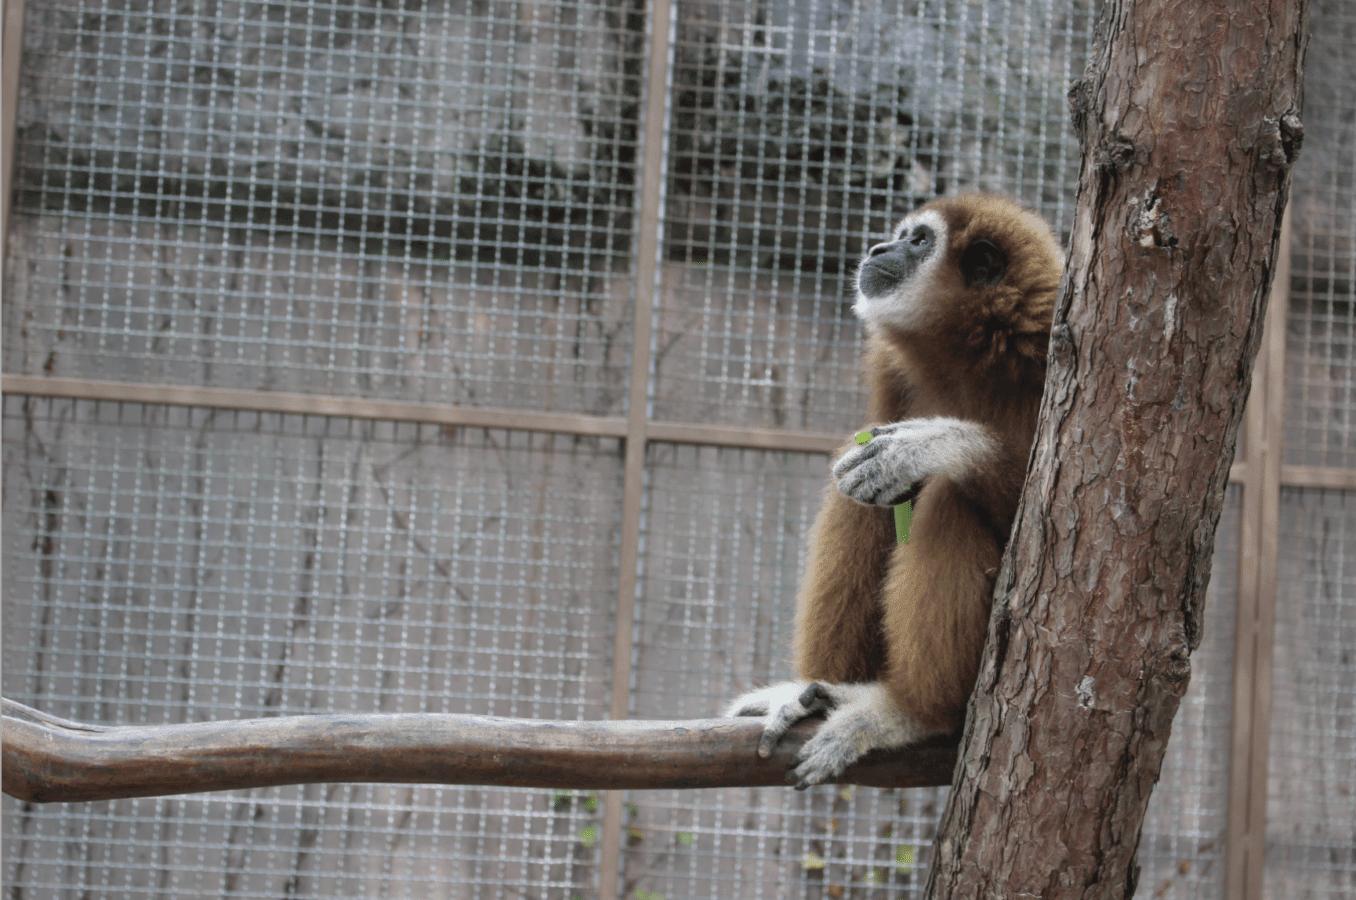 5 Fascinating Zoos to Visit in Korea | 10 Magazine Korea